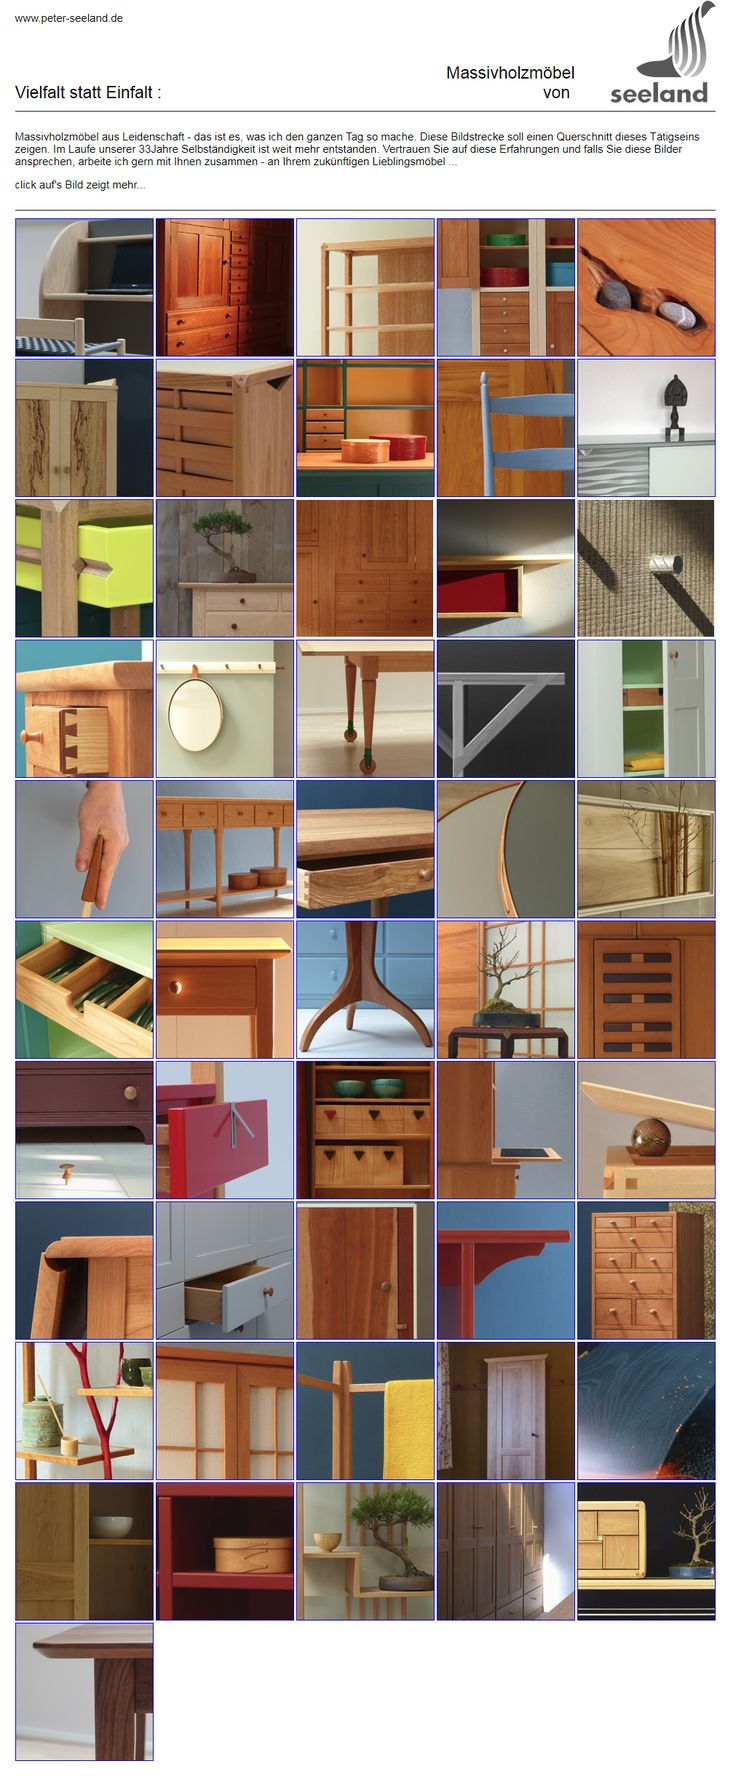 screenshot,Massivholzmöbel P.S. website // Seeland